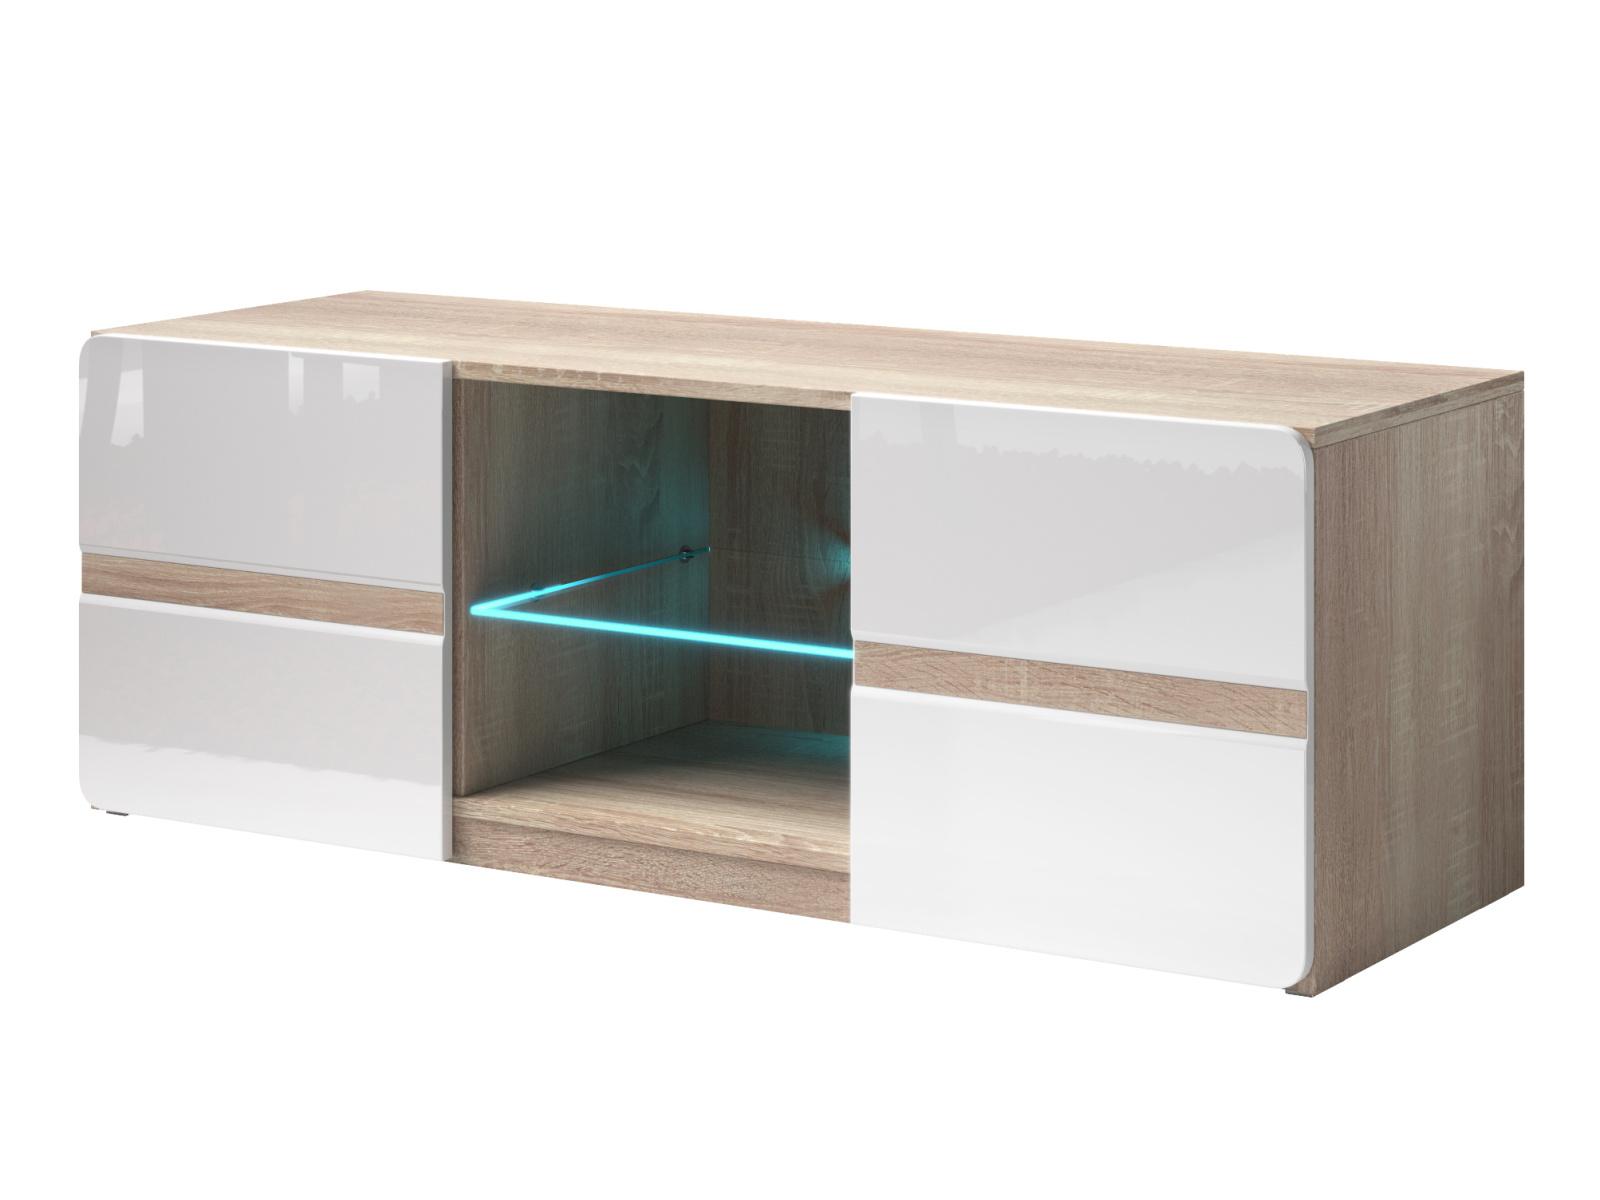 Smartshop SELENE TV stolek TYP 41, dub sonoma světlý/bílá lesk